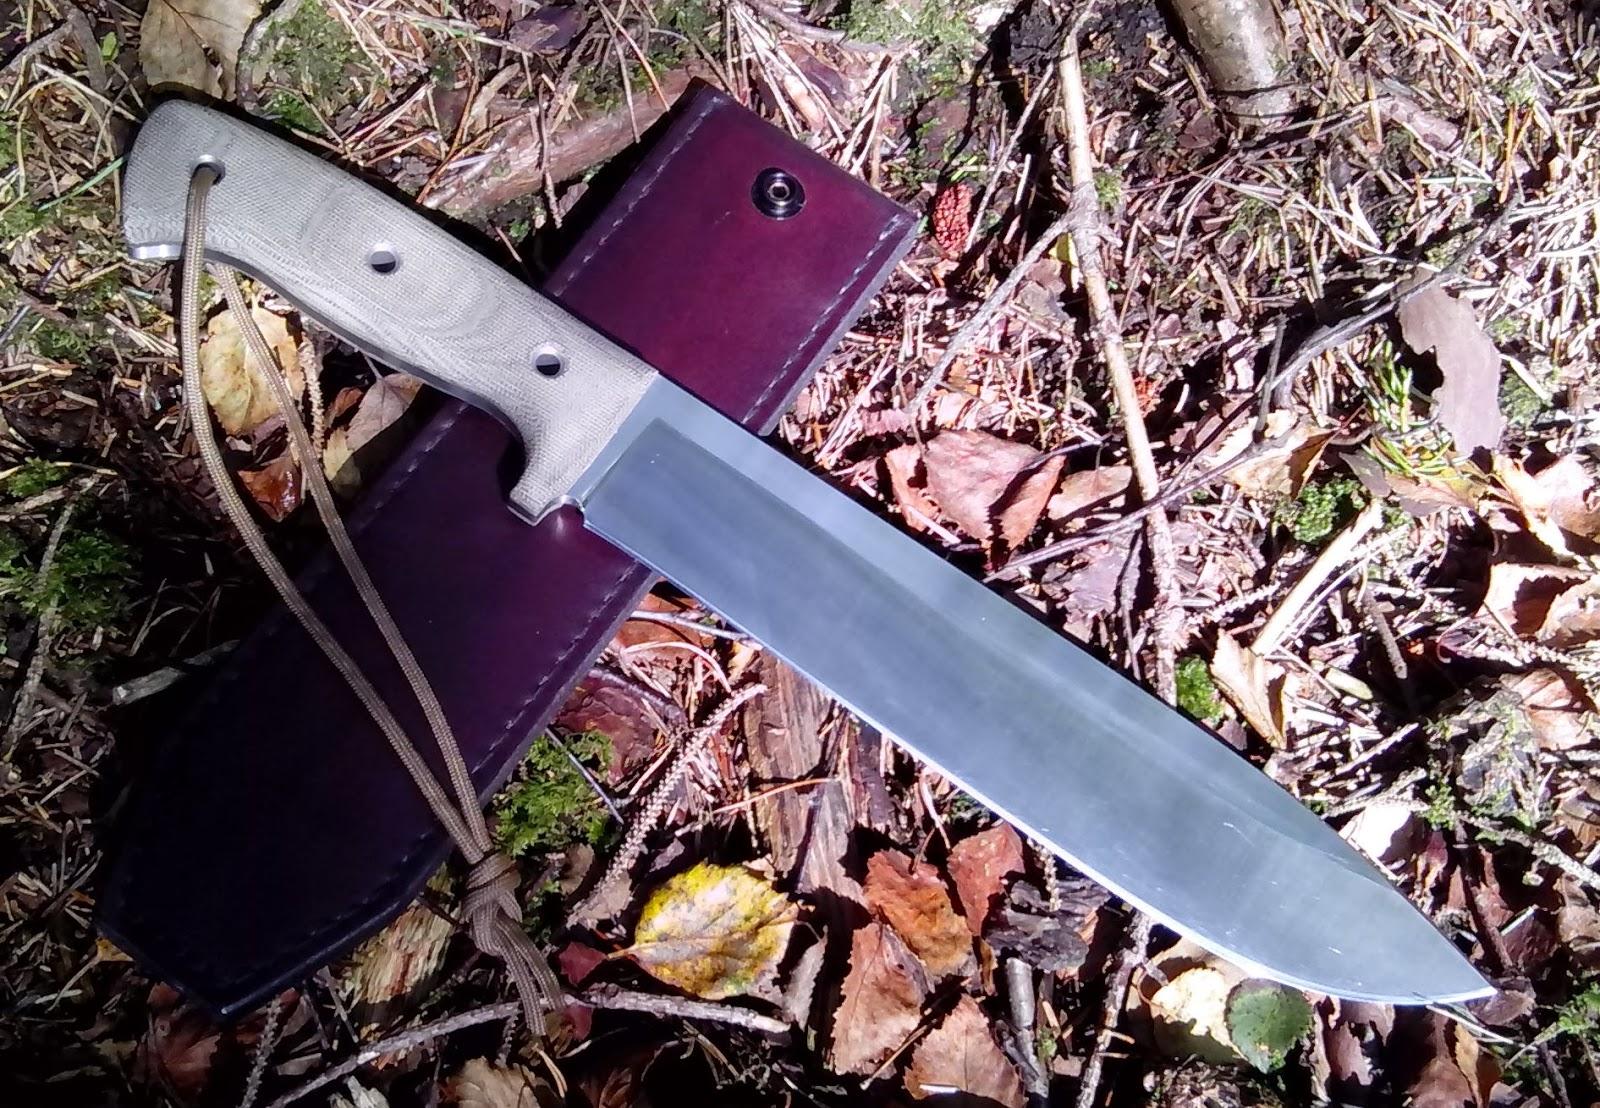 Haakonsen knife and tool